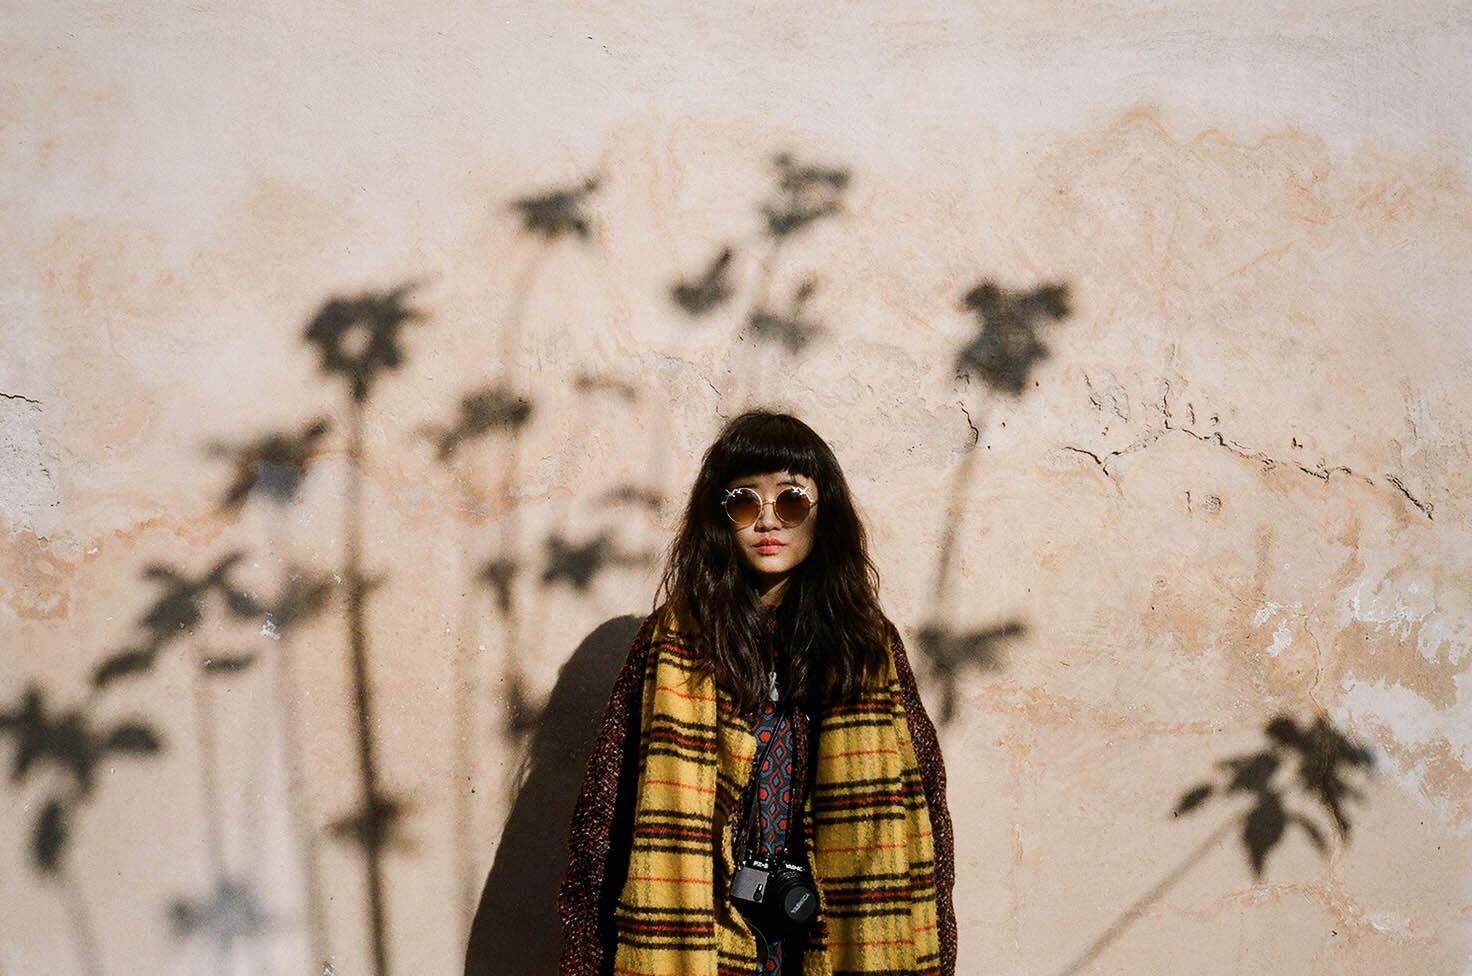 Morocco_Helen_Västrik_-56.jpg